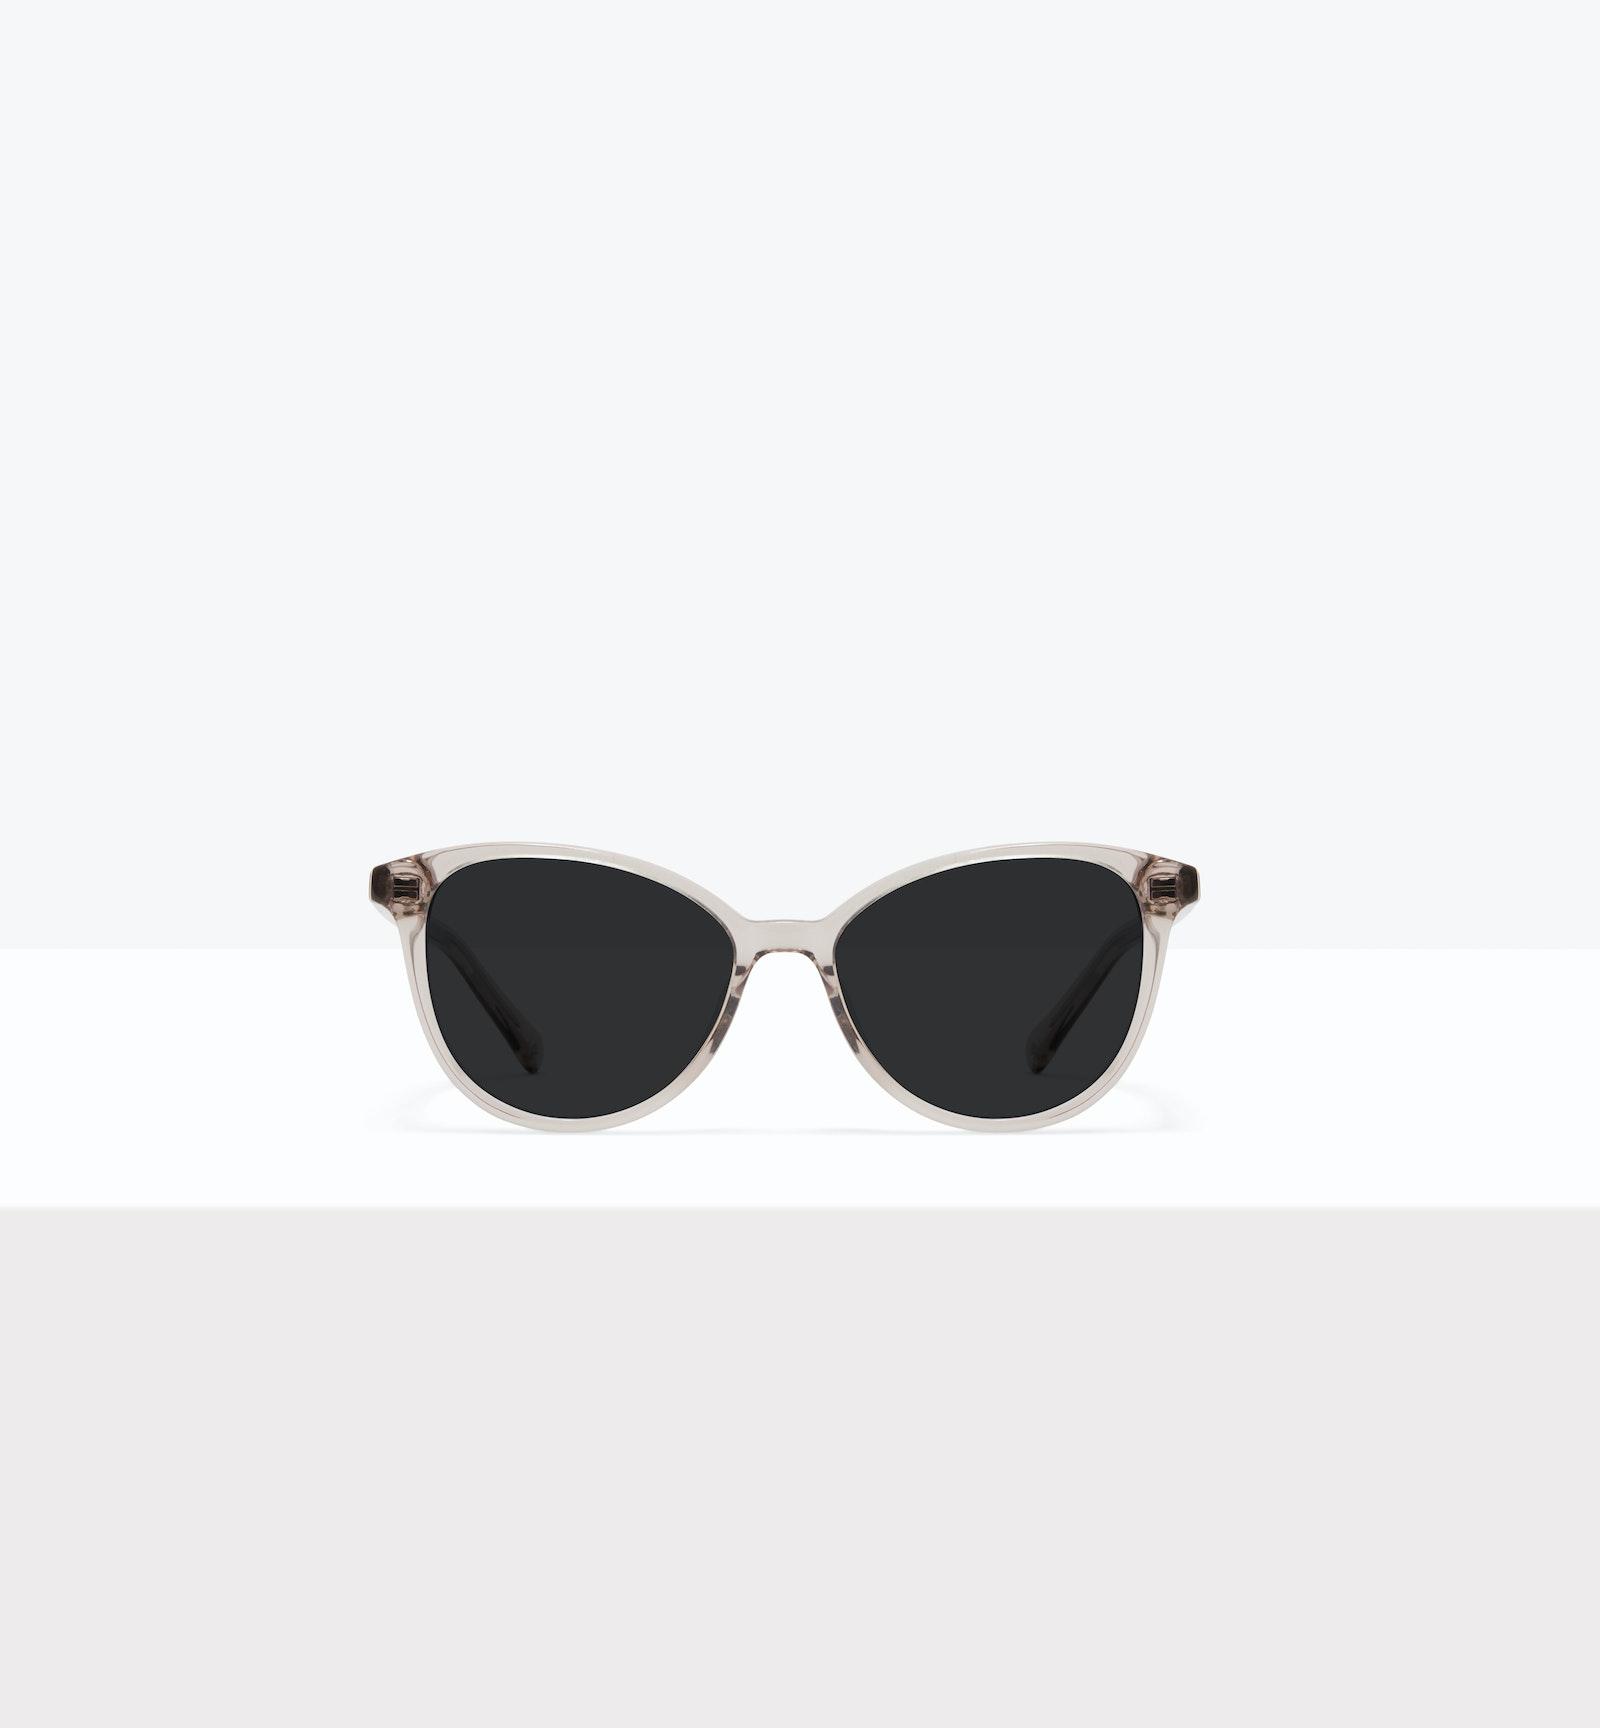 Affordable Fashion Glasses Cat Eye Sunglasses Women Esprit L Sand